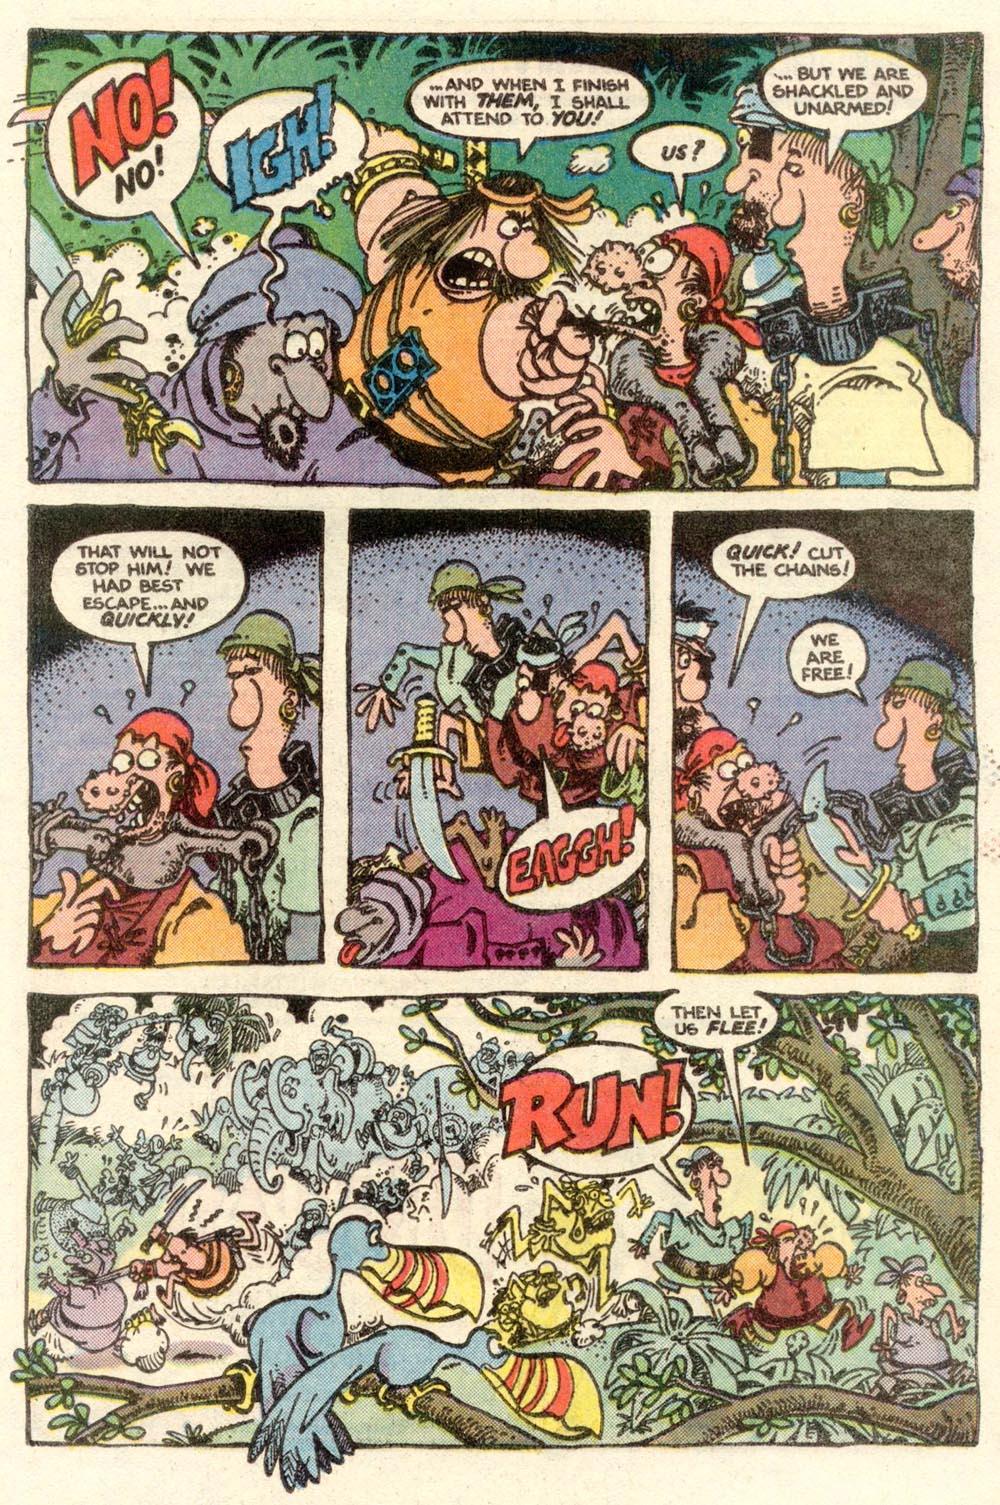 Read online Sergio Aragonés Groo the Wanderer comic -  Issue #5 - 20